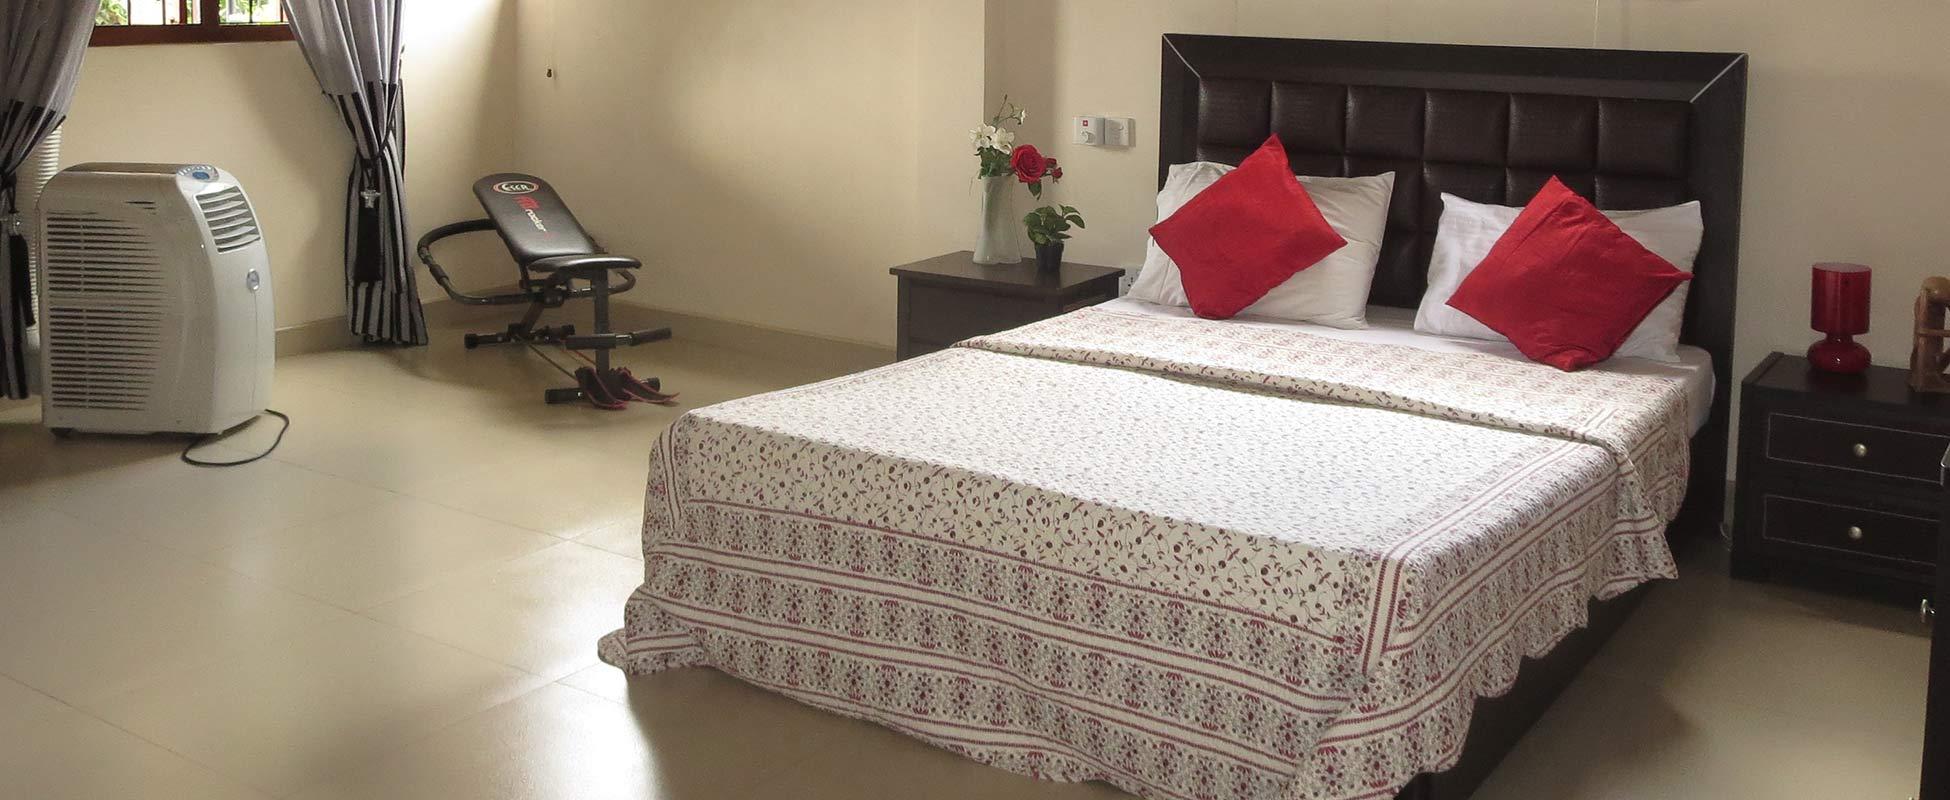 sri lanka ferienwohnung in kandy. Black Bedroom Furniture Sets. Home Design Ideas